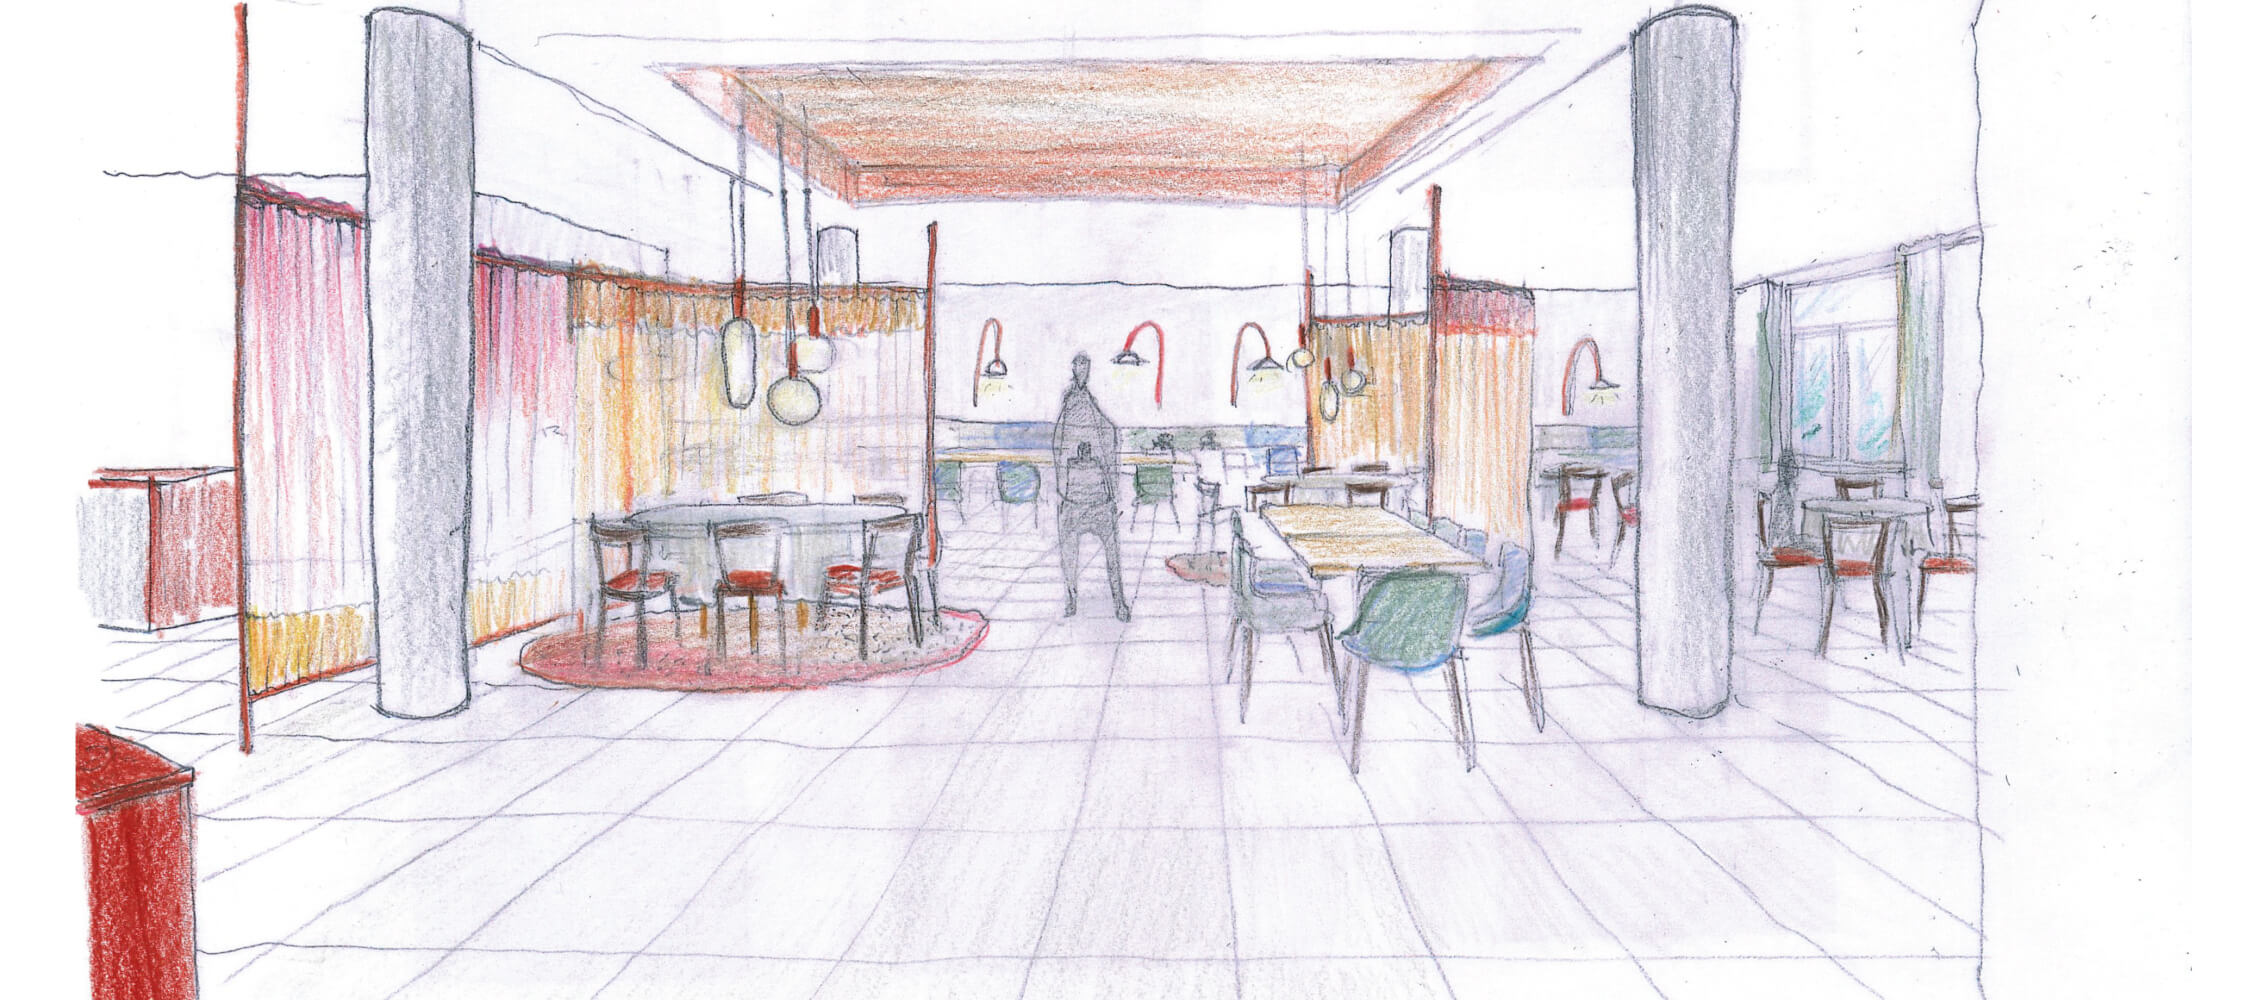 City_Hotel_Merano_Renovation_Detail_Restaurant